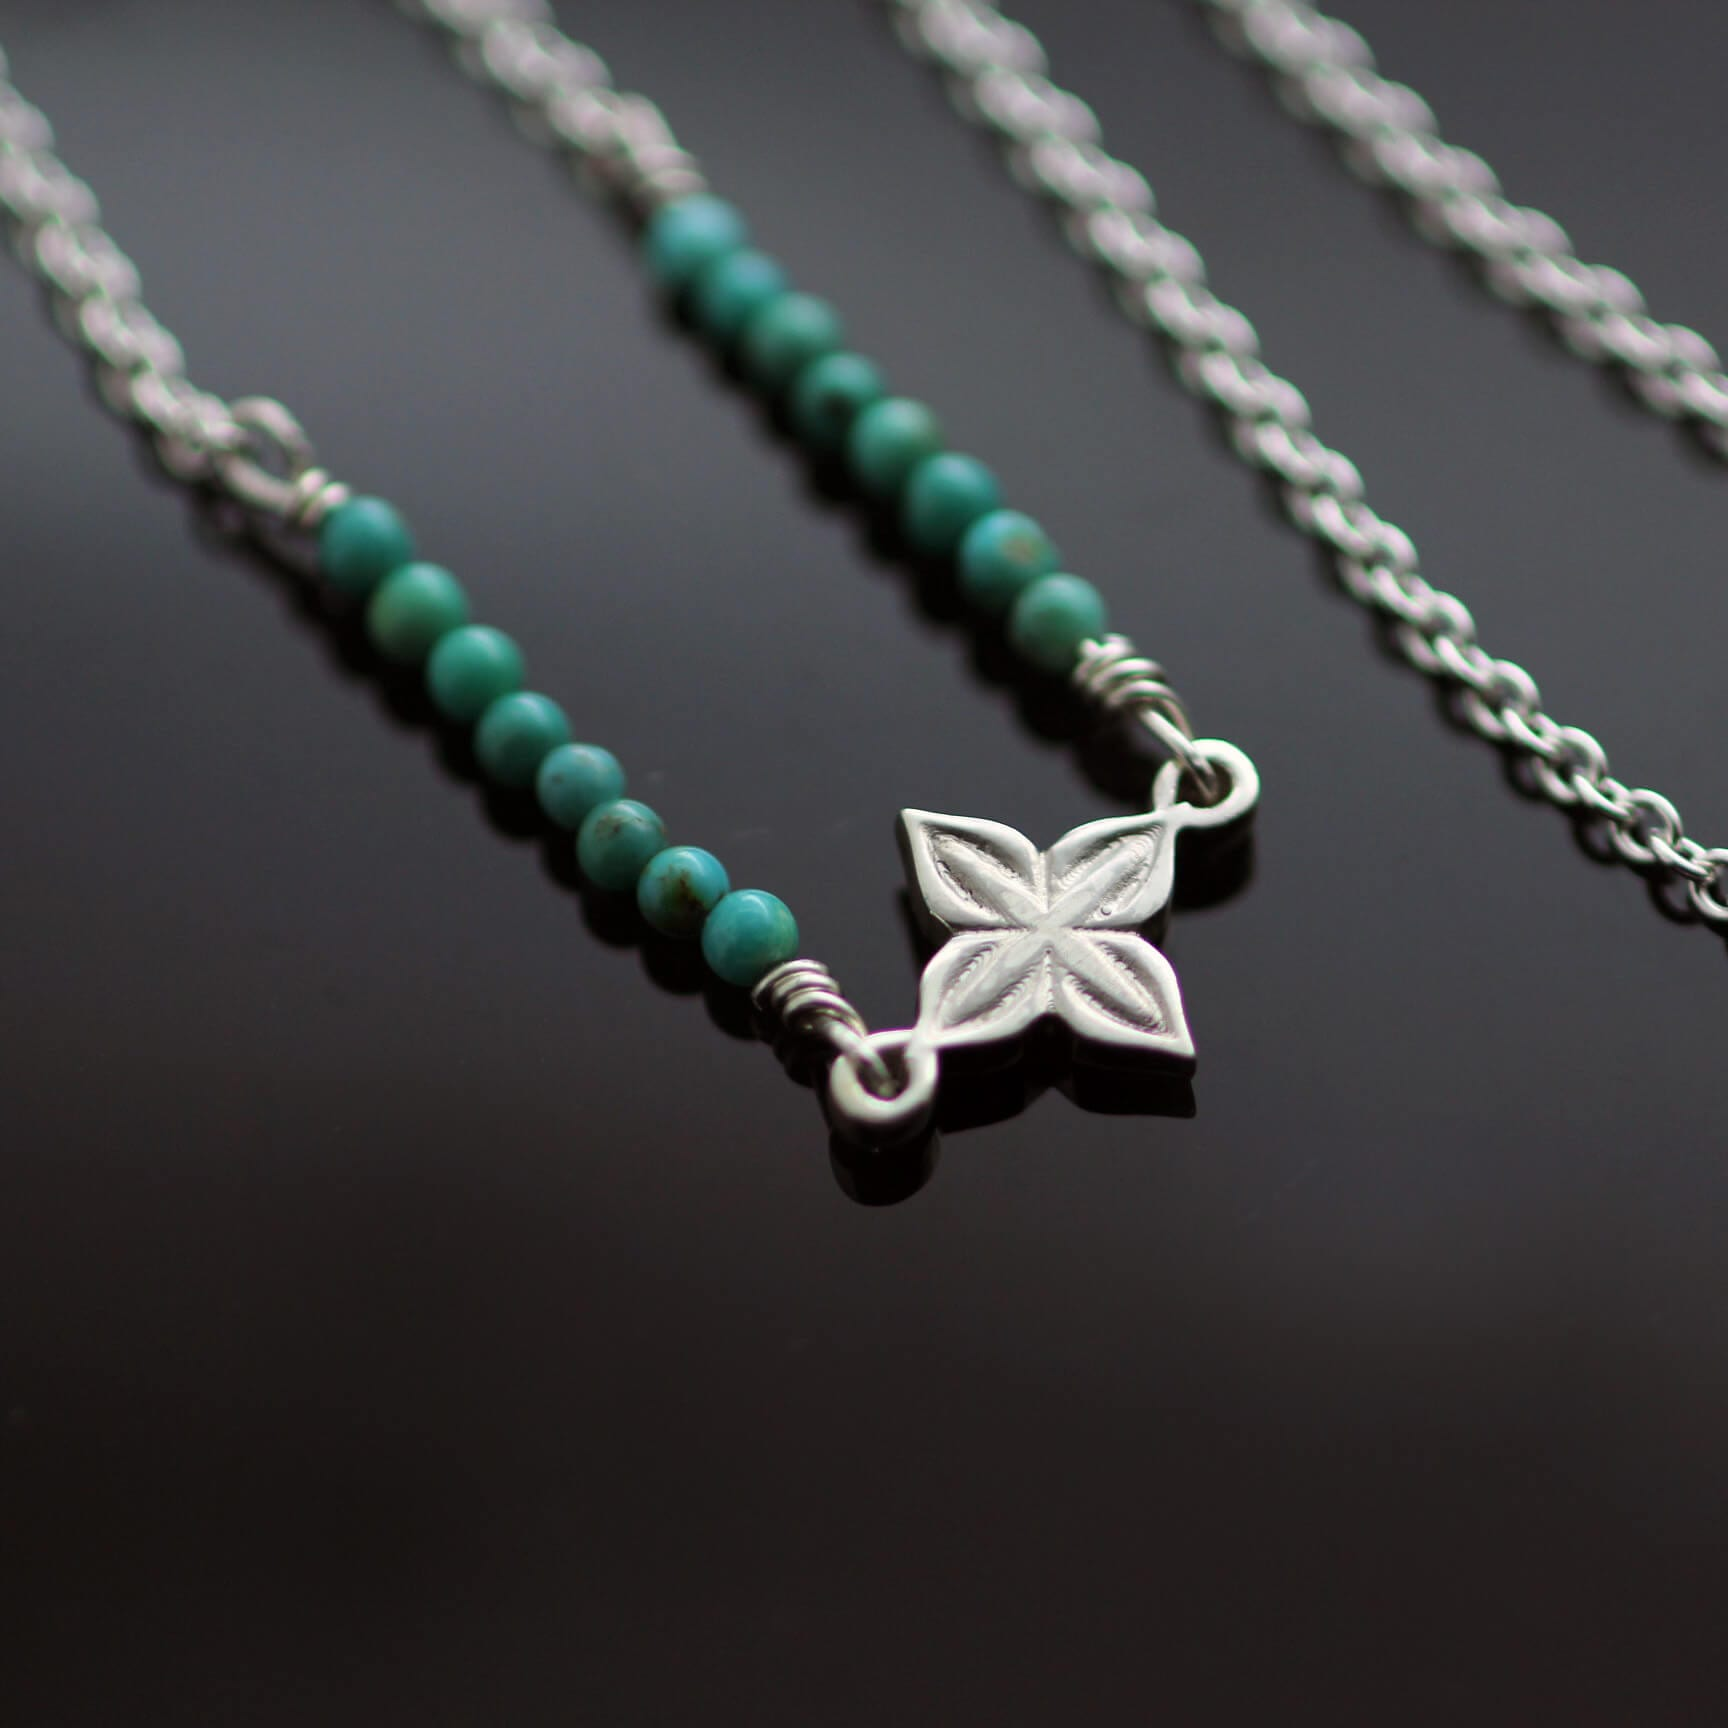 Handmade turquoise silver boho necklace